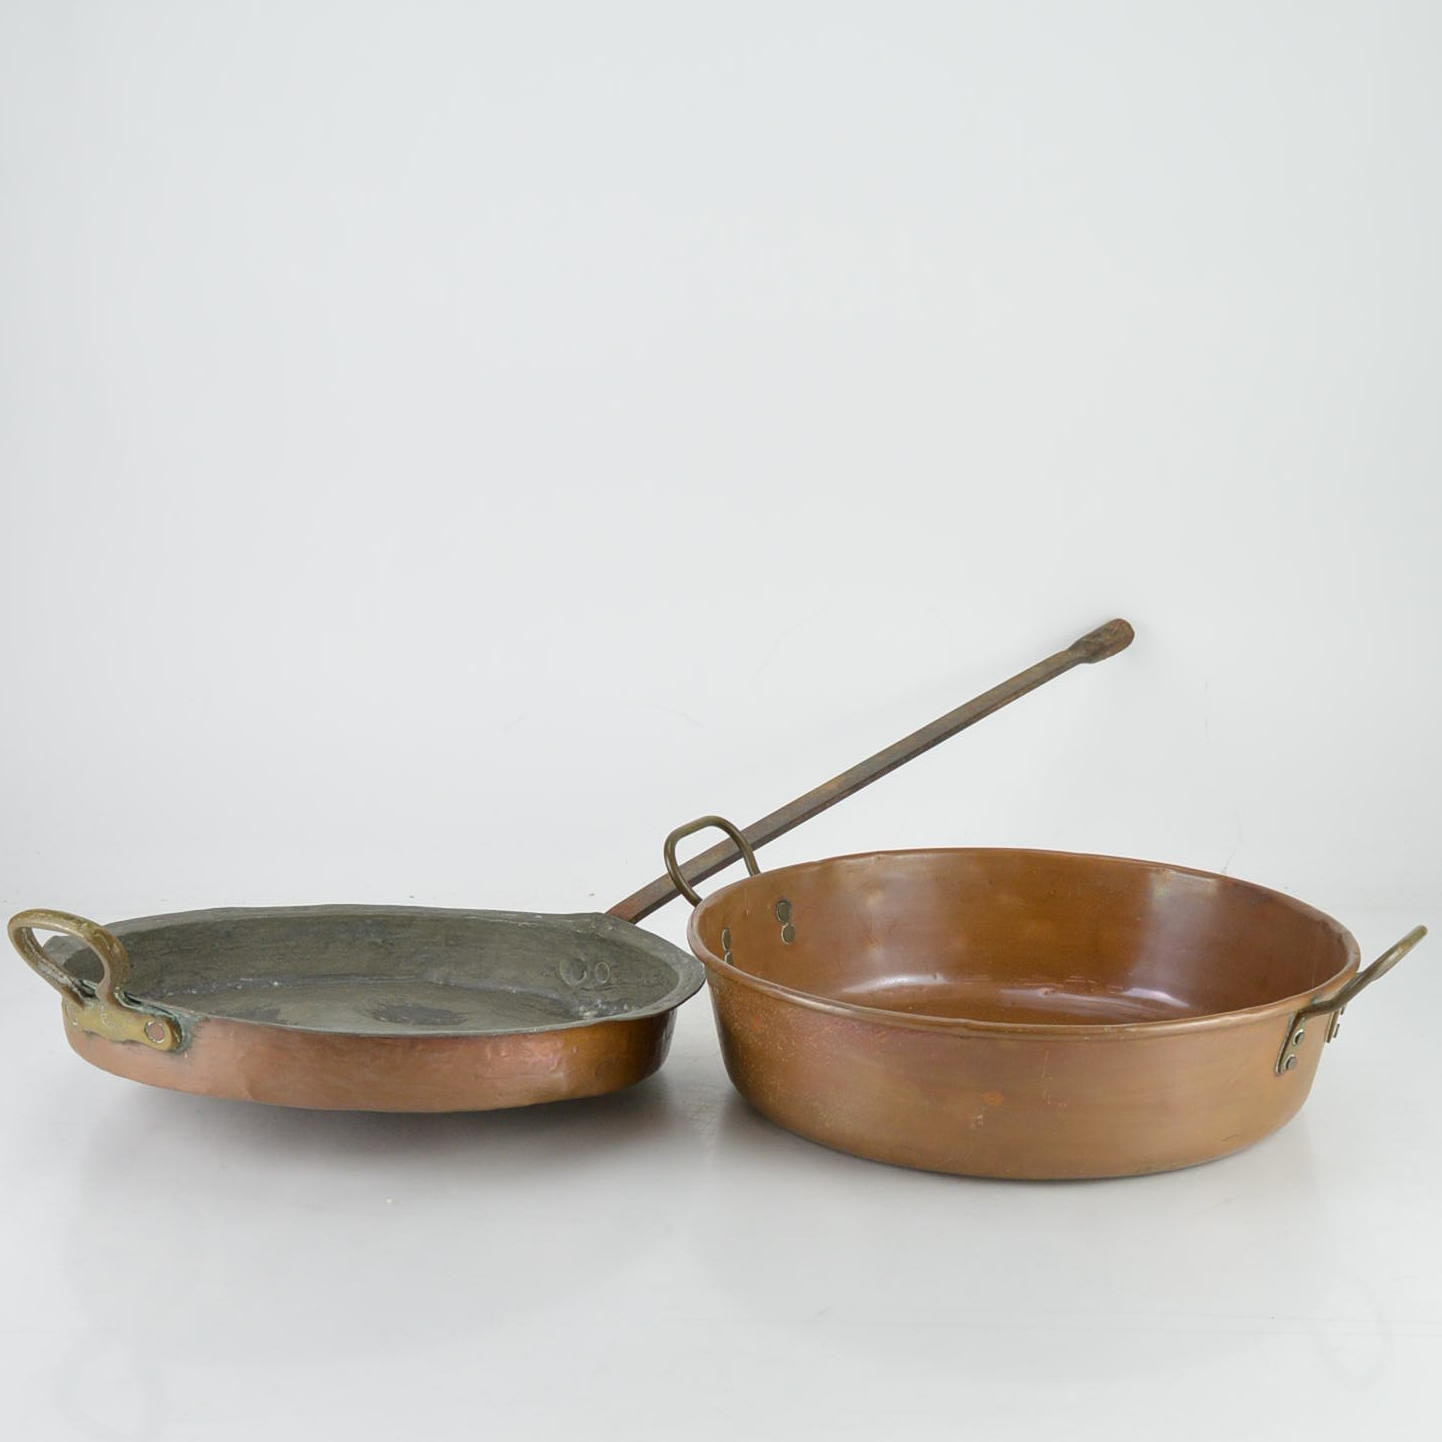 Antique Copper Poaching and Rondeau Pans